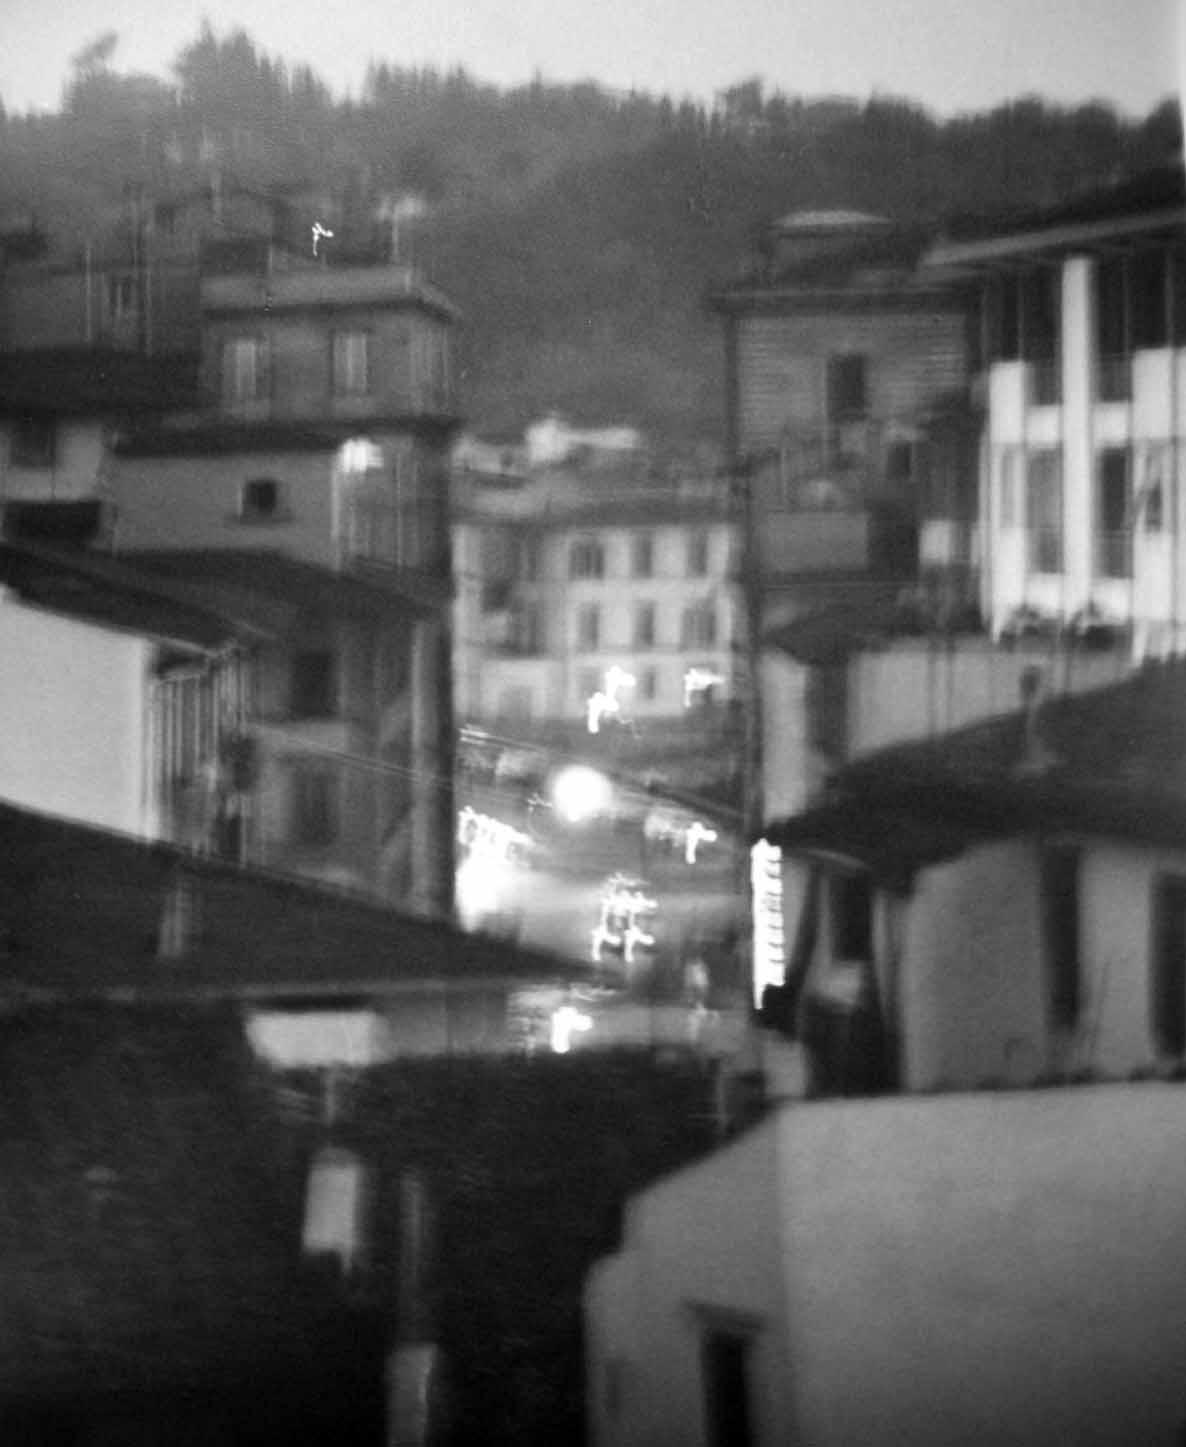 Night Blurr in Florence Italy lr.jpg